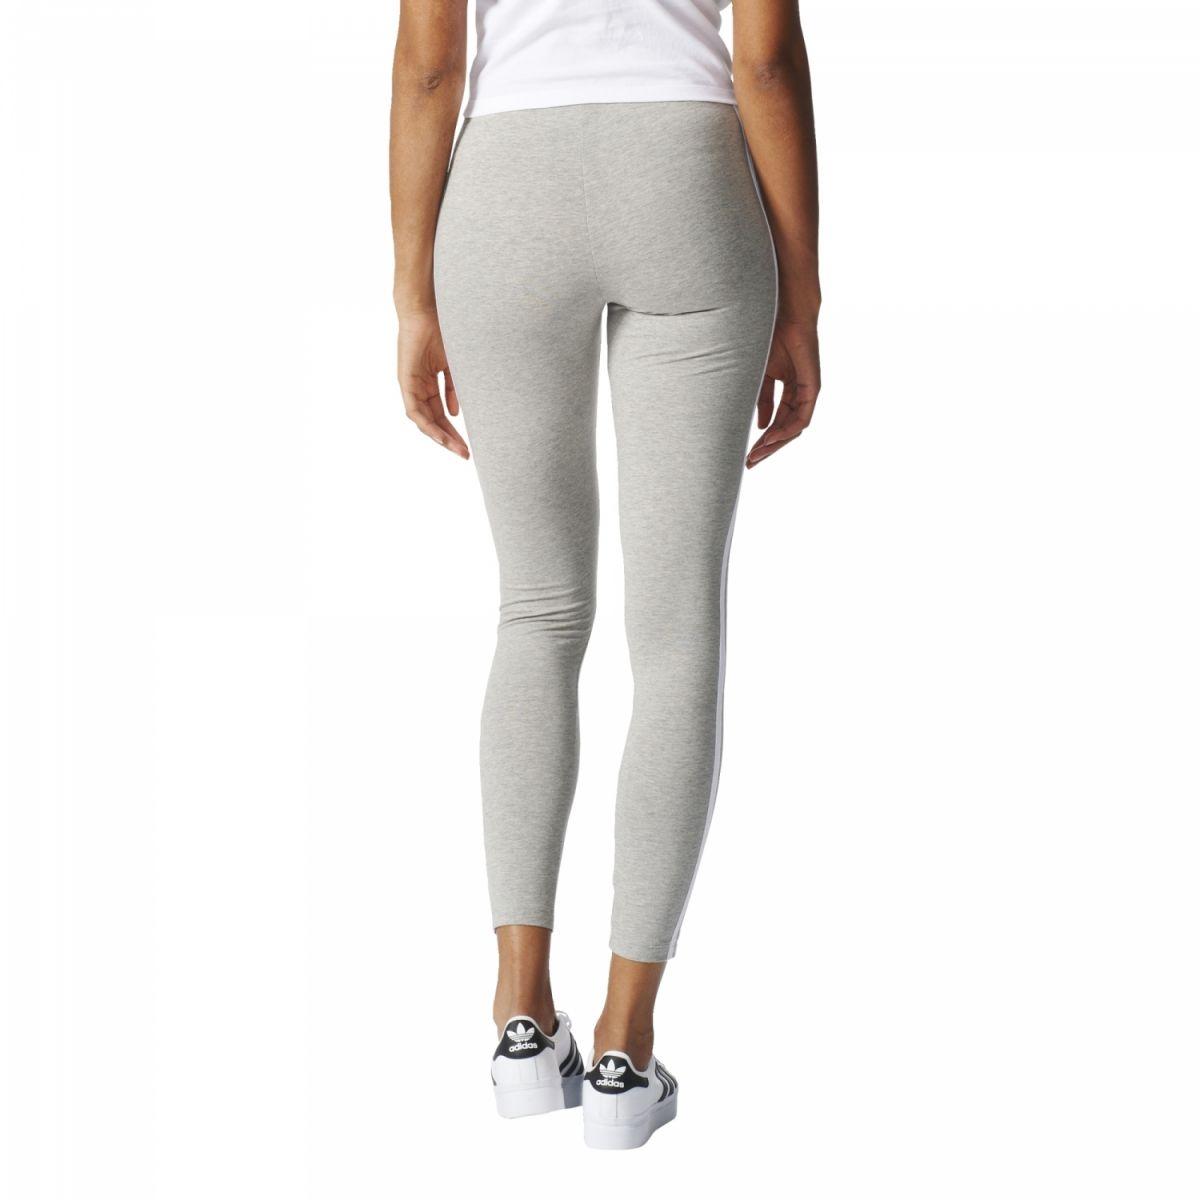 sport klingenmaier adidas originals 3 streifen leggings damen hose grau wei online kaufen. Black Bedroom Furniture Sets. Home Design Ideas